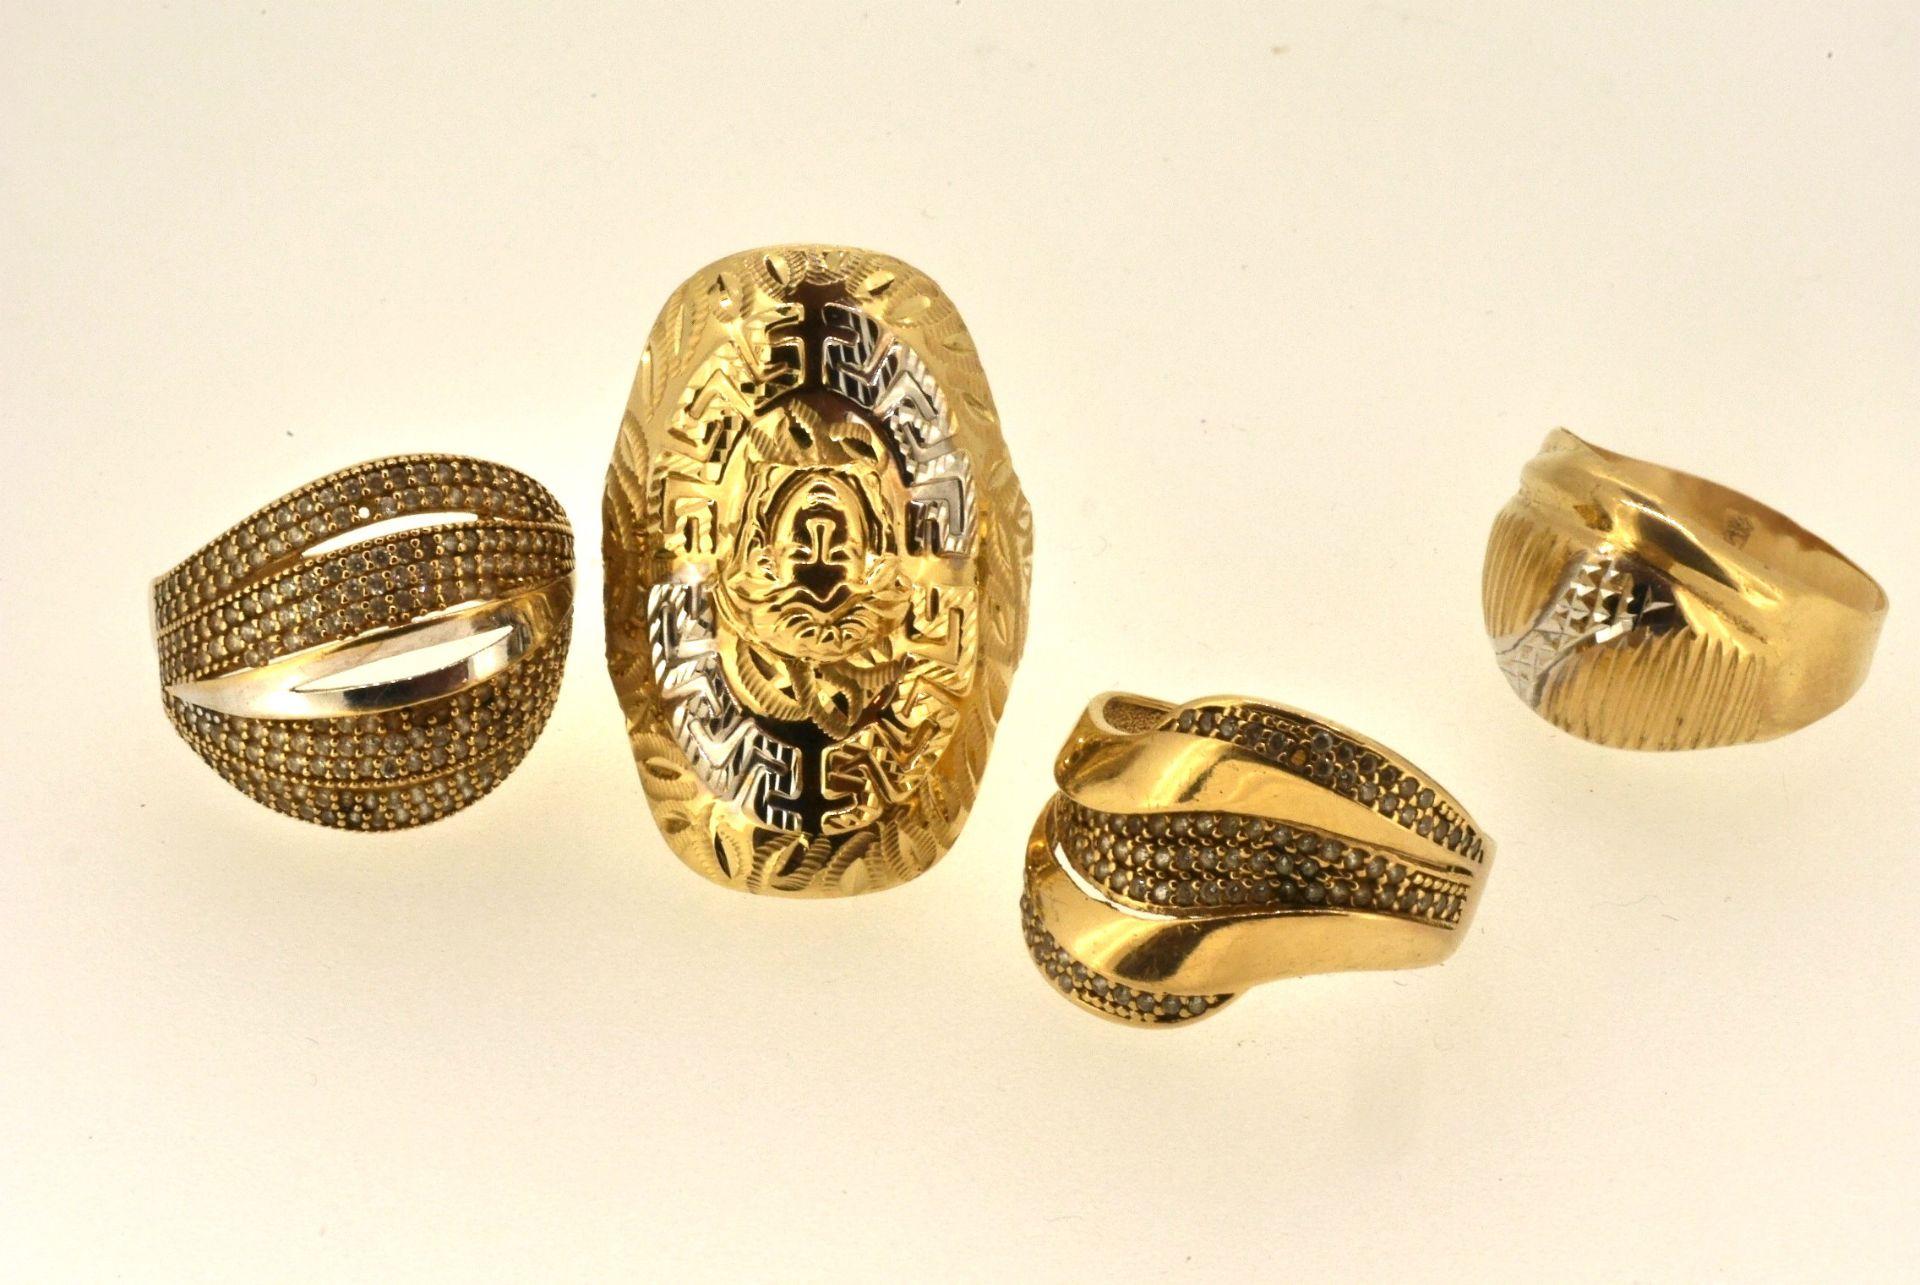 4 Ringe WG/GG 585, Zirkonia (fehlen z.T.), 11,35 Gramm